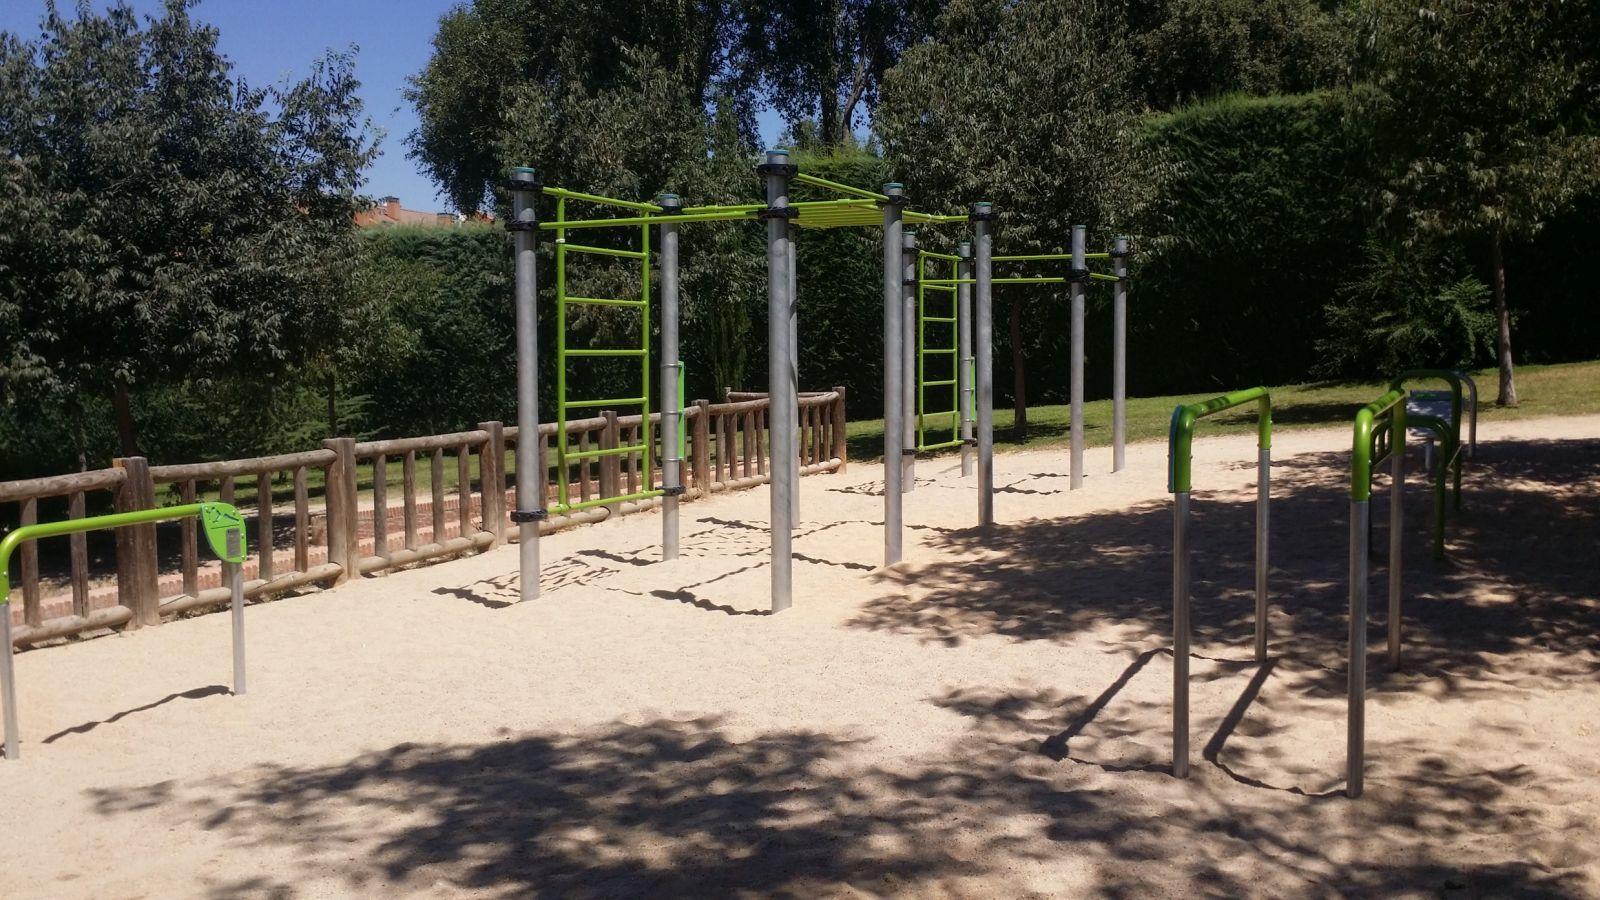 estructura calistenia barras paralelas mostoles avenida sauces